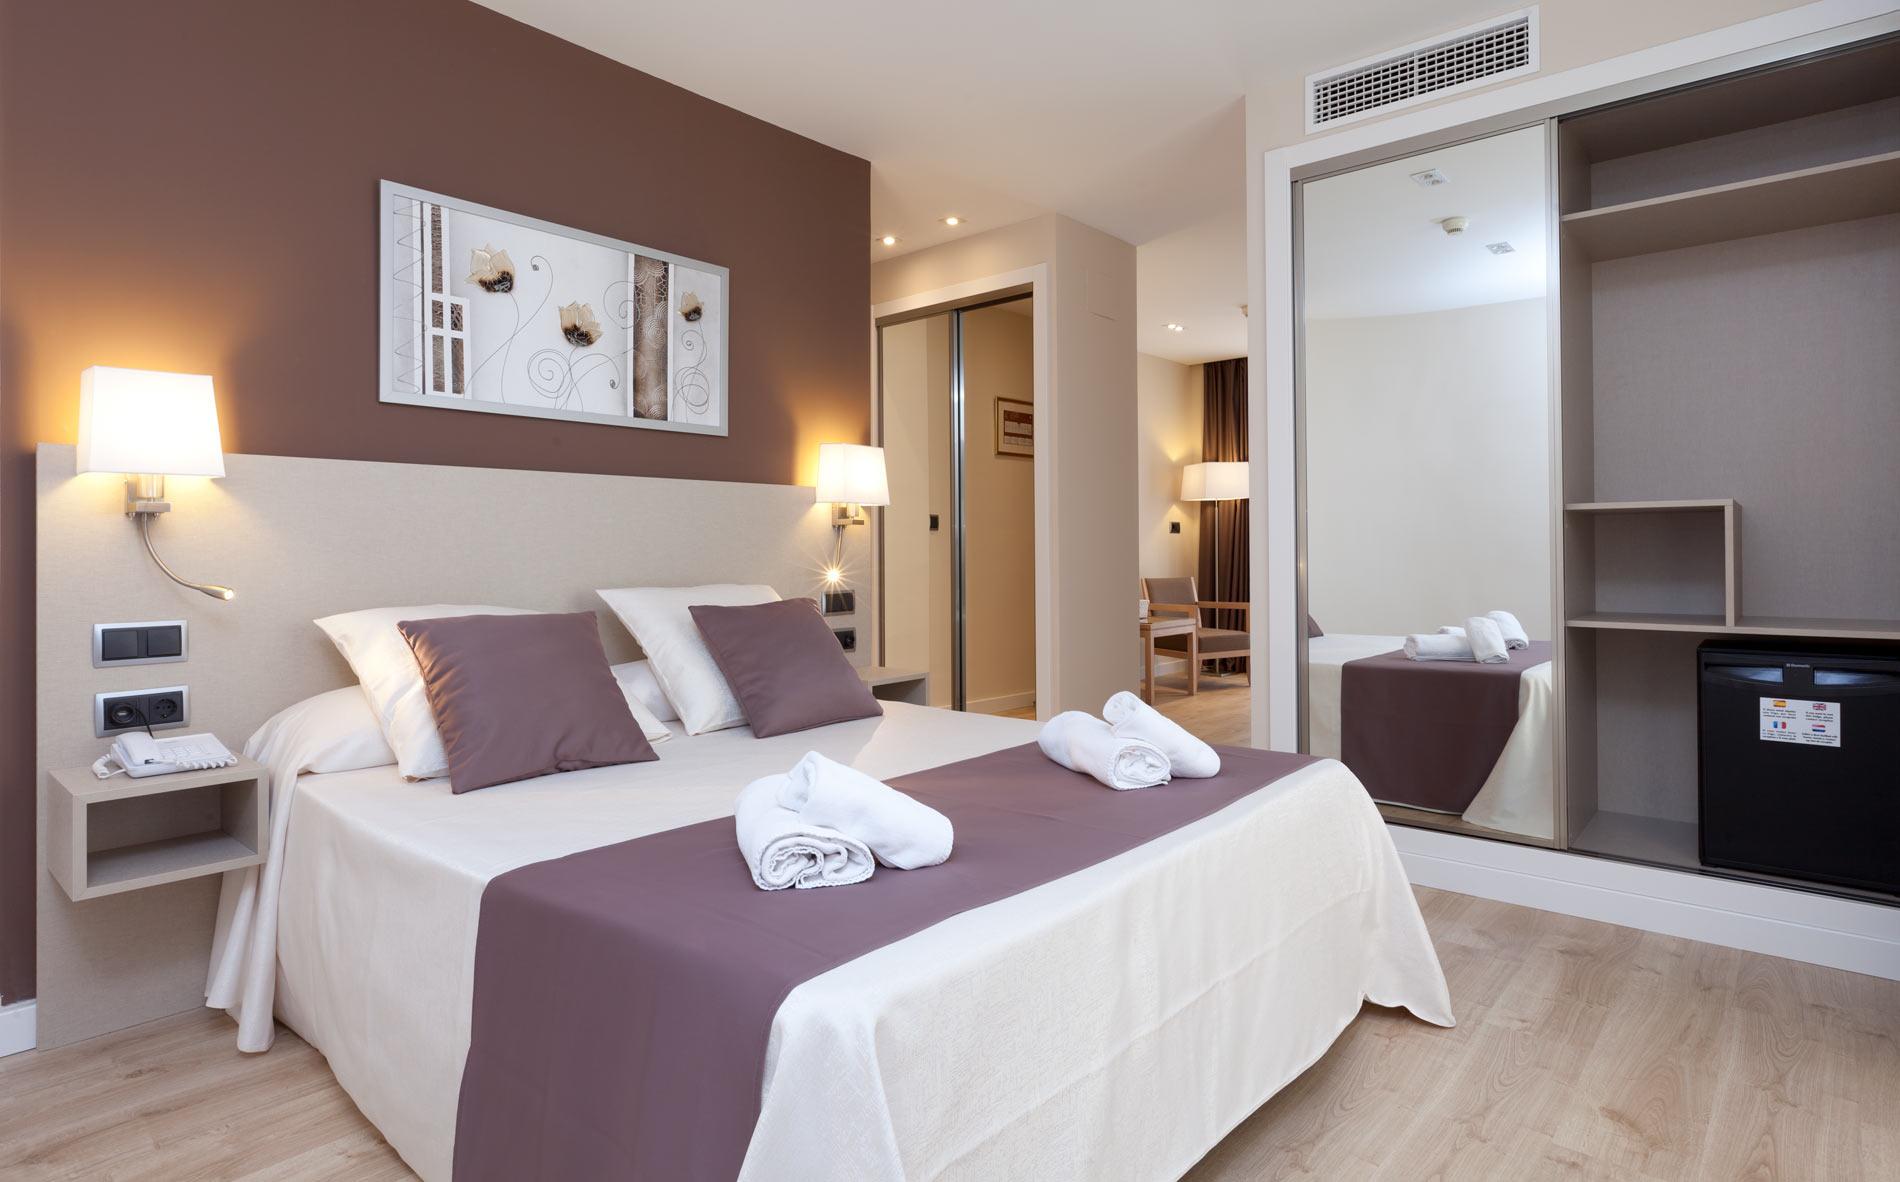 Hotel Helios Benidorm Disabled Rooms